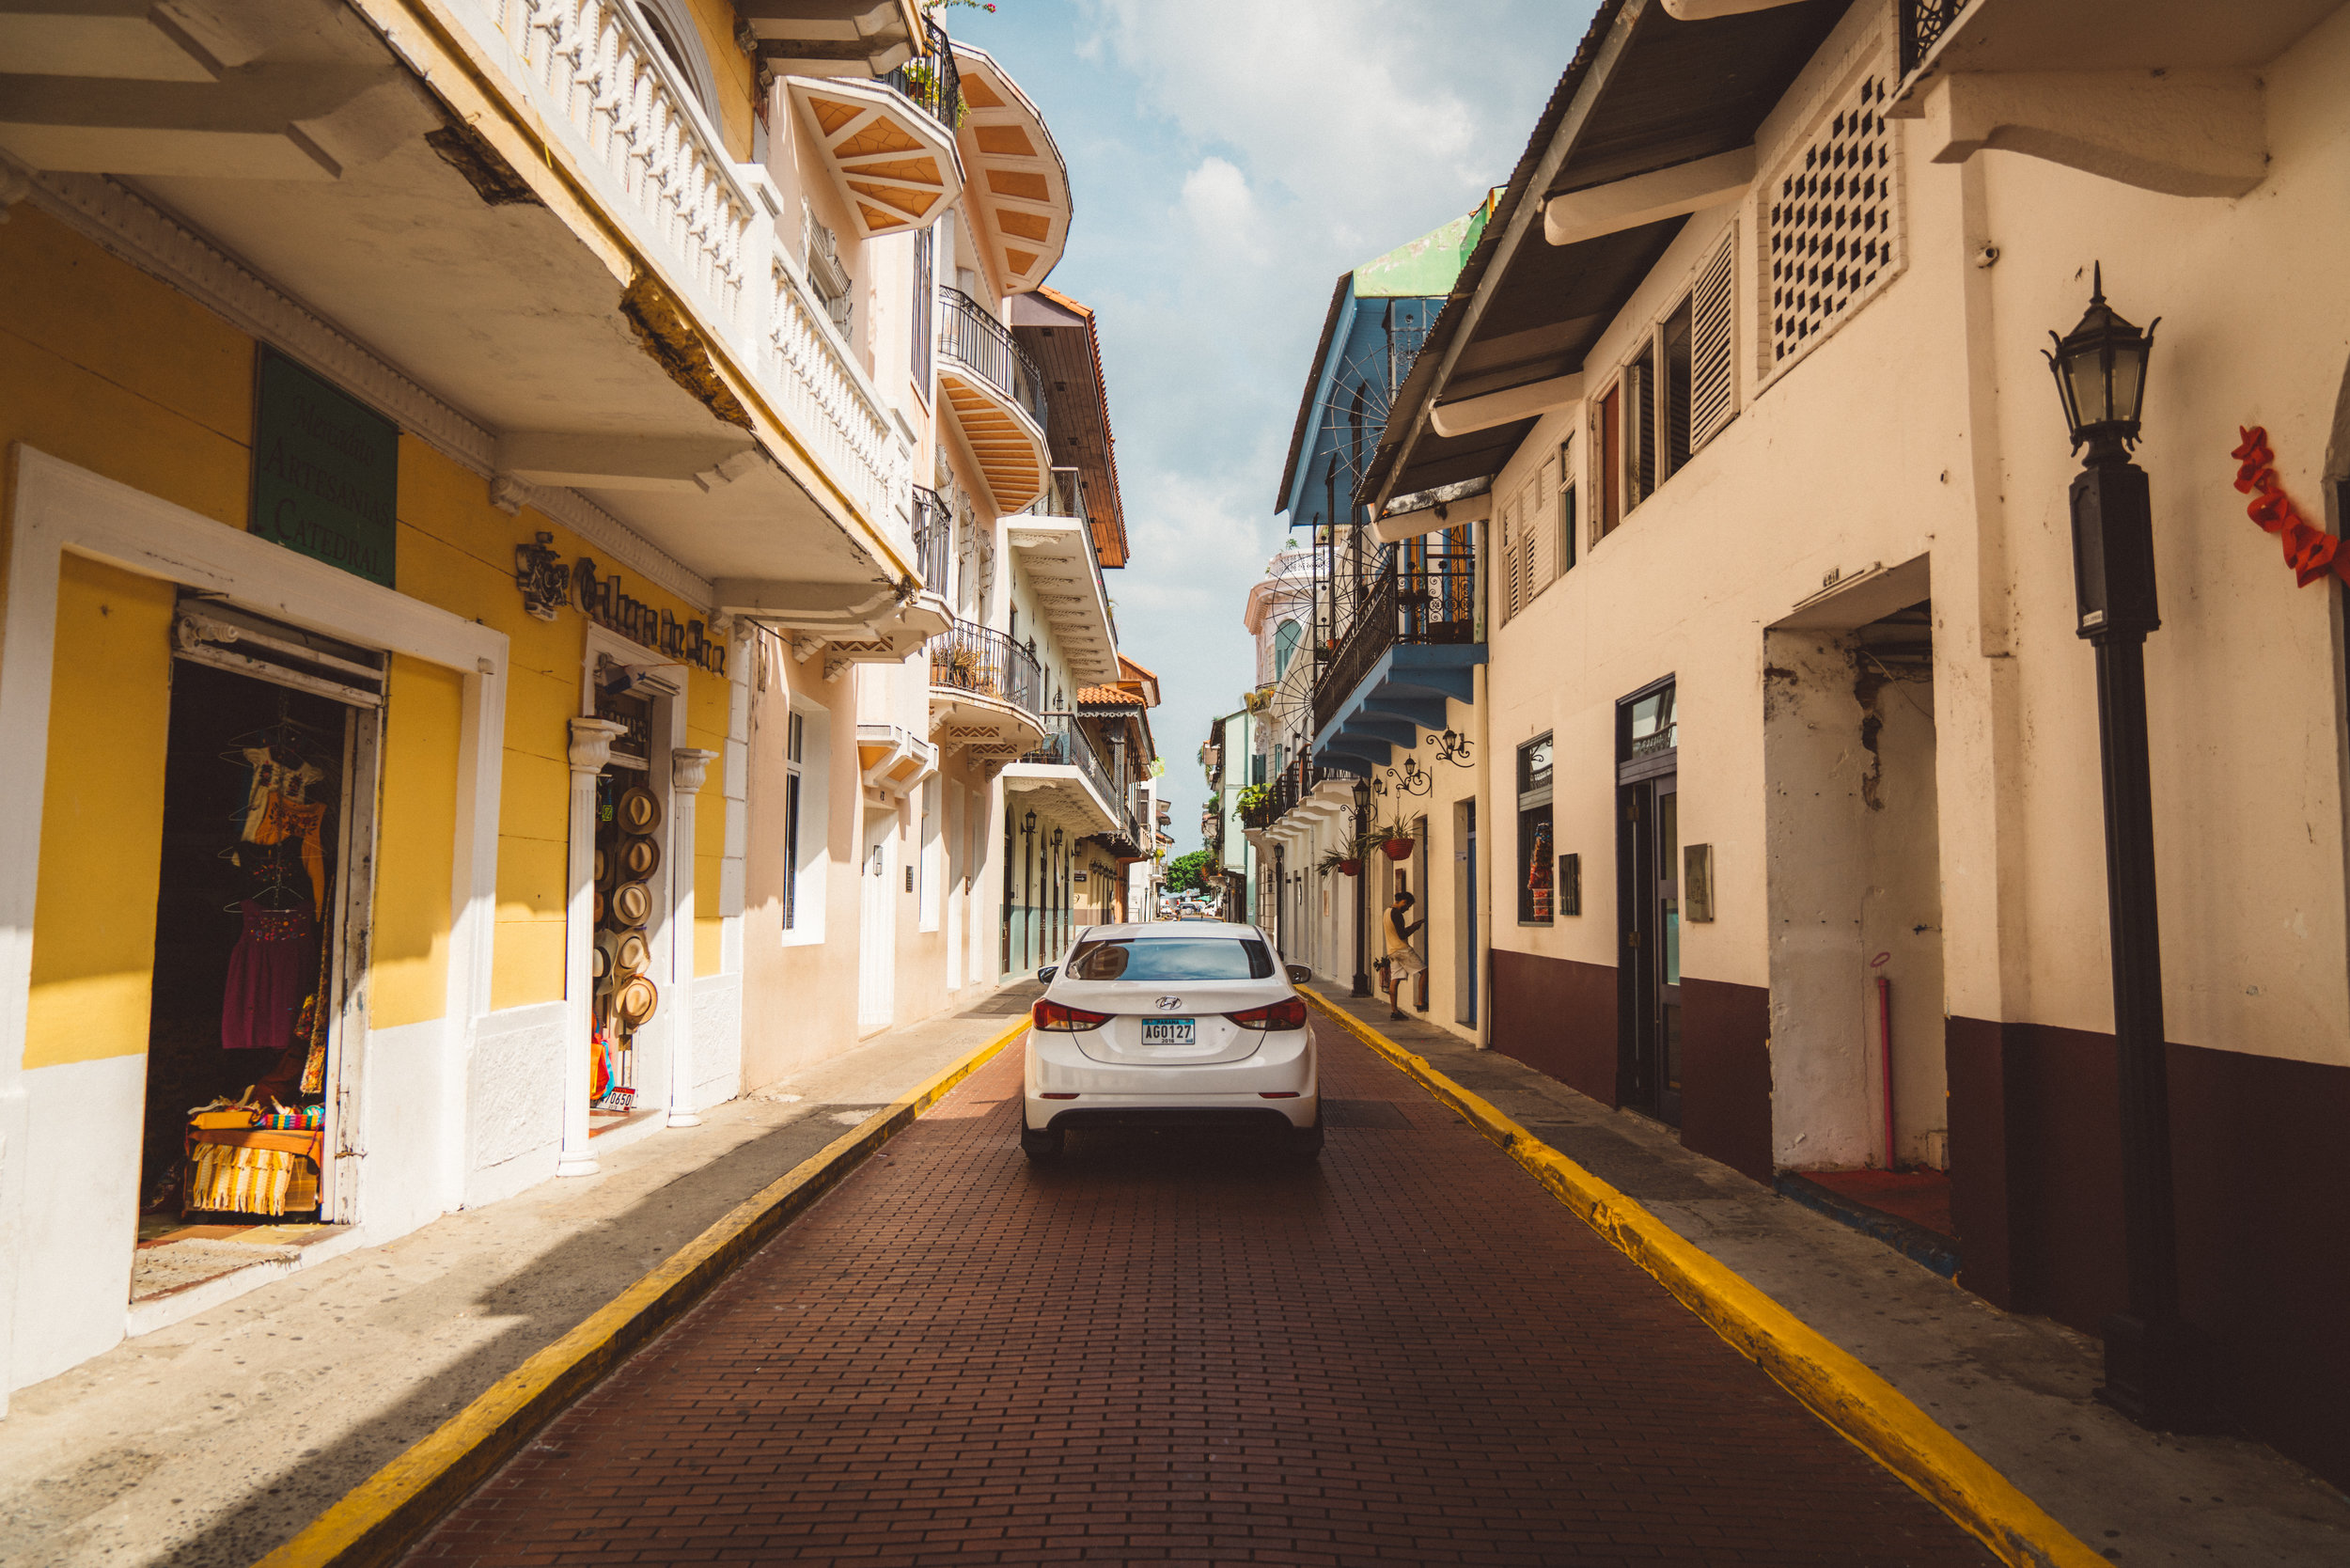 Casco Viejo (Old Quarter).